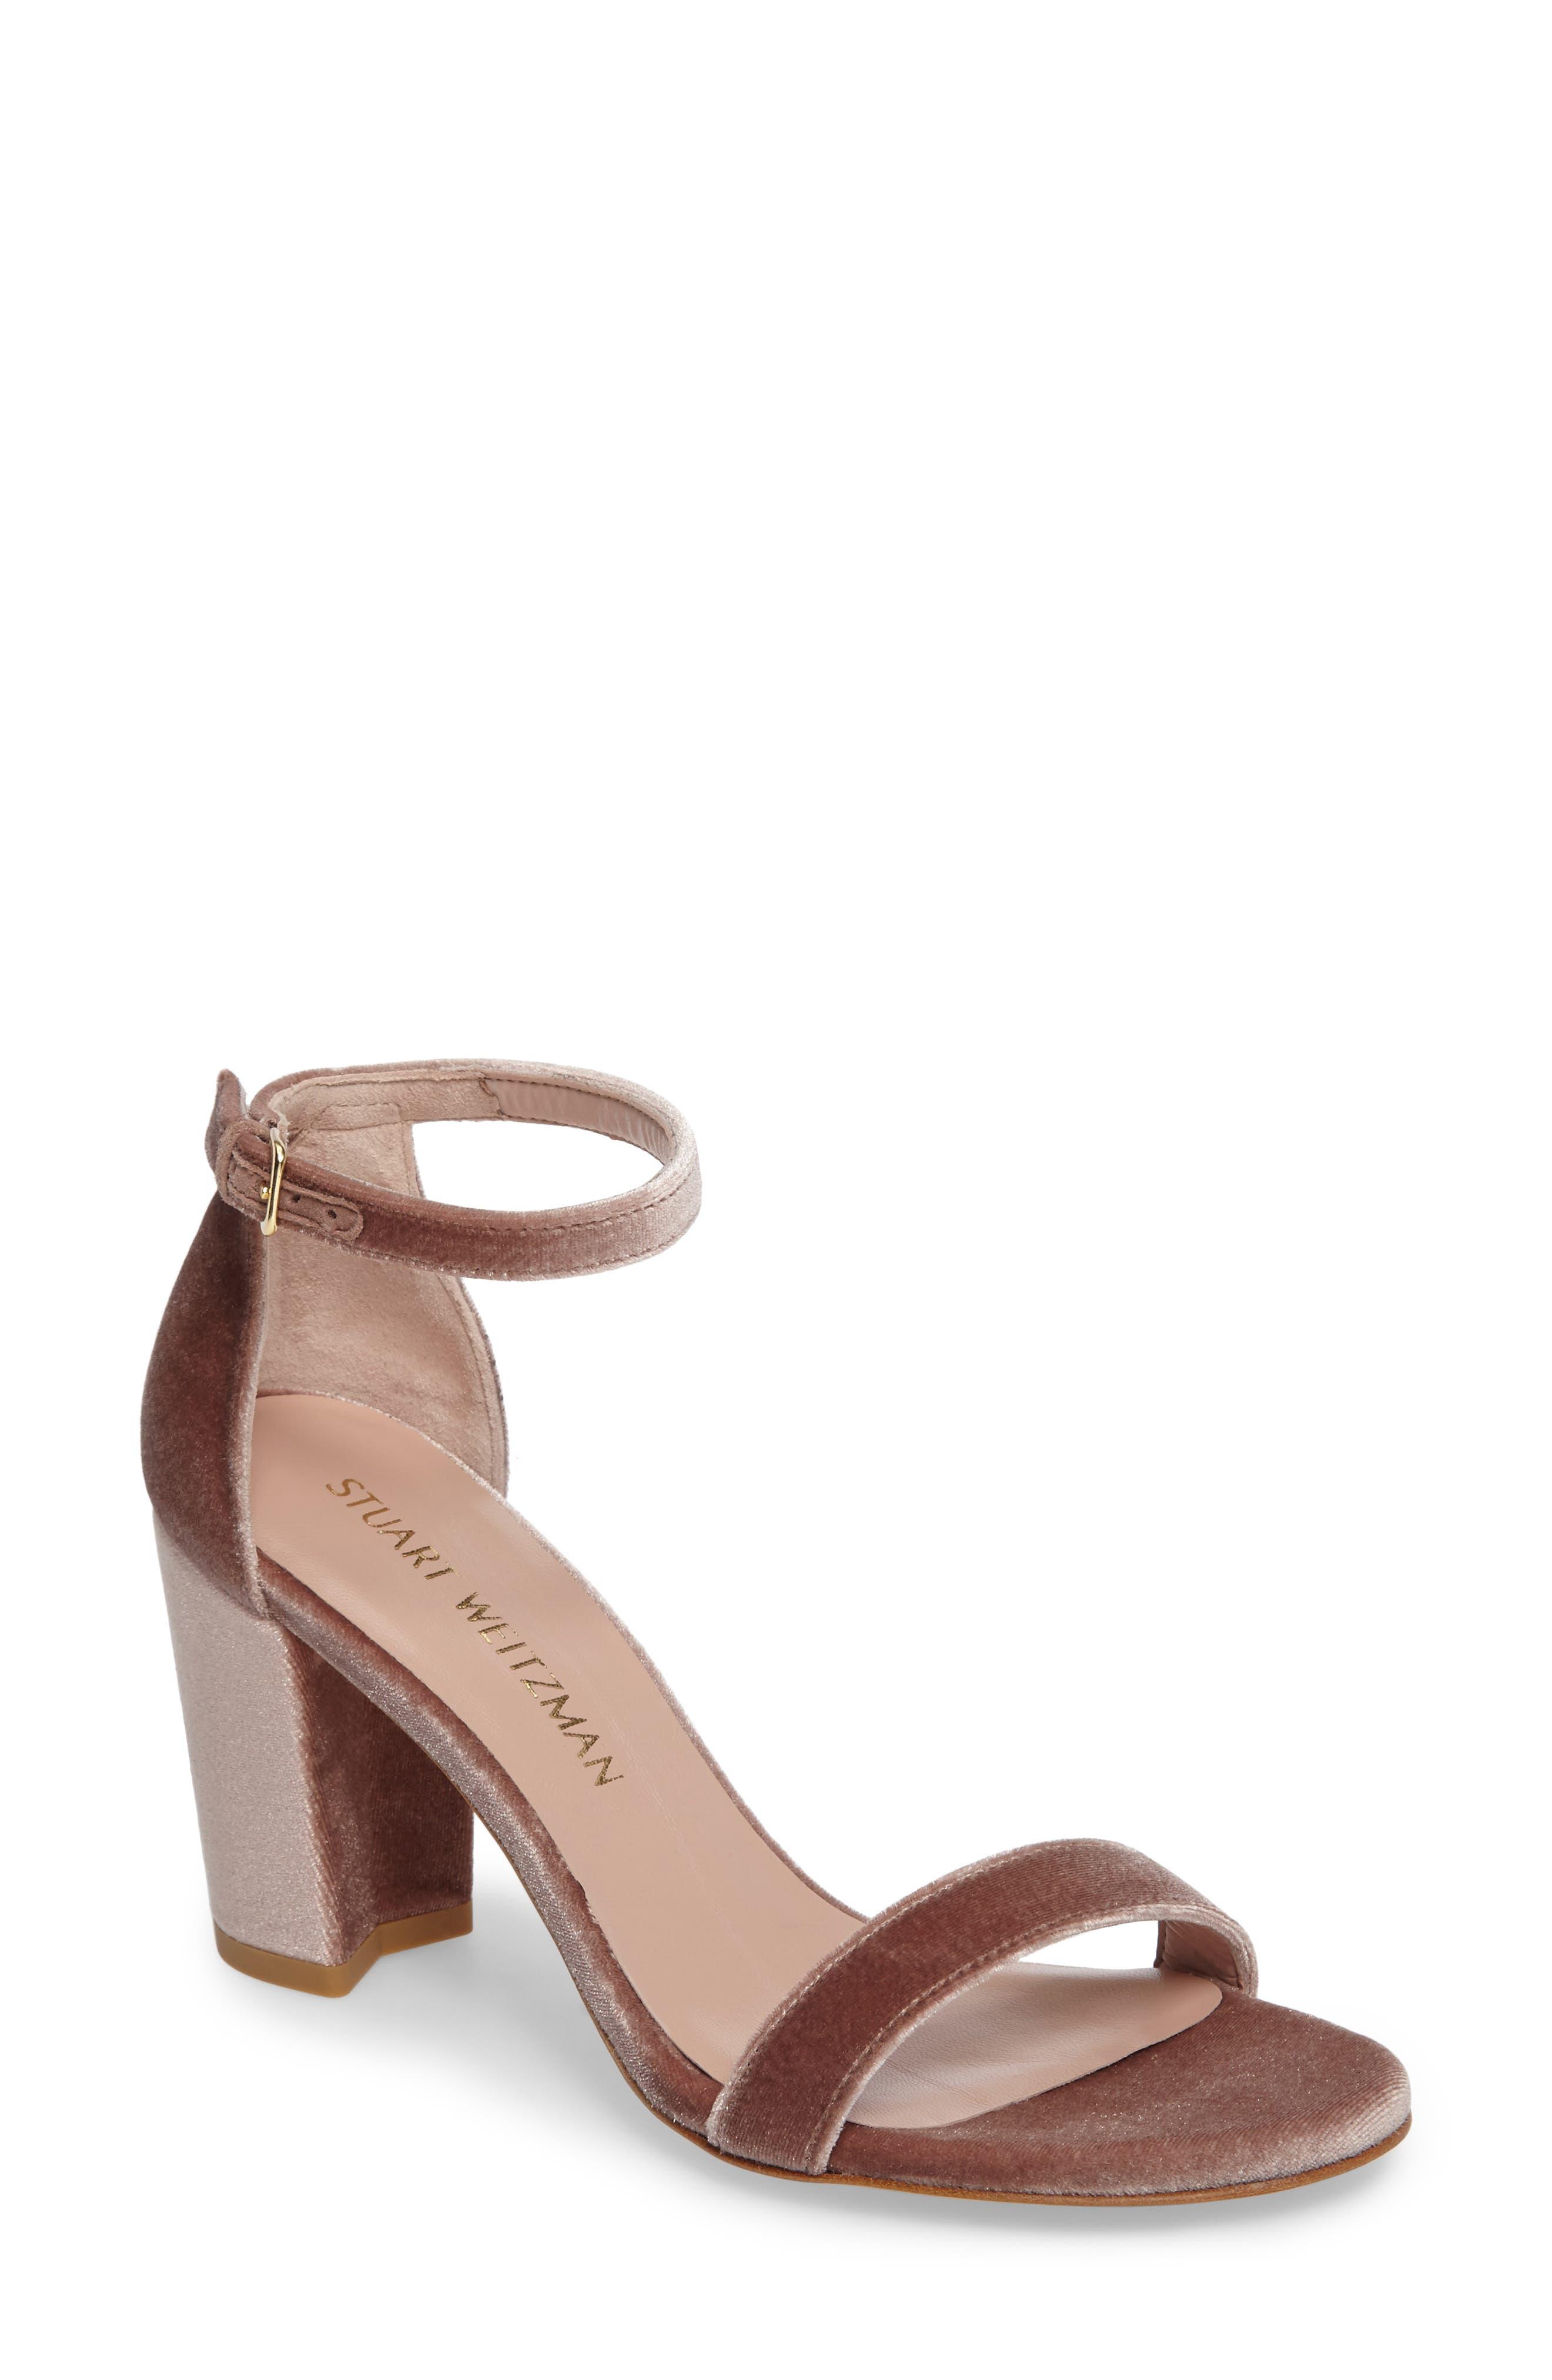 NearlyNude Ankle Strap Sandal,                             Main thumbnail 1, color,                             Candy Velvet